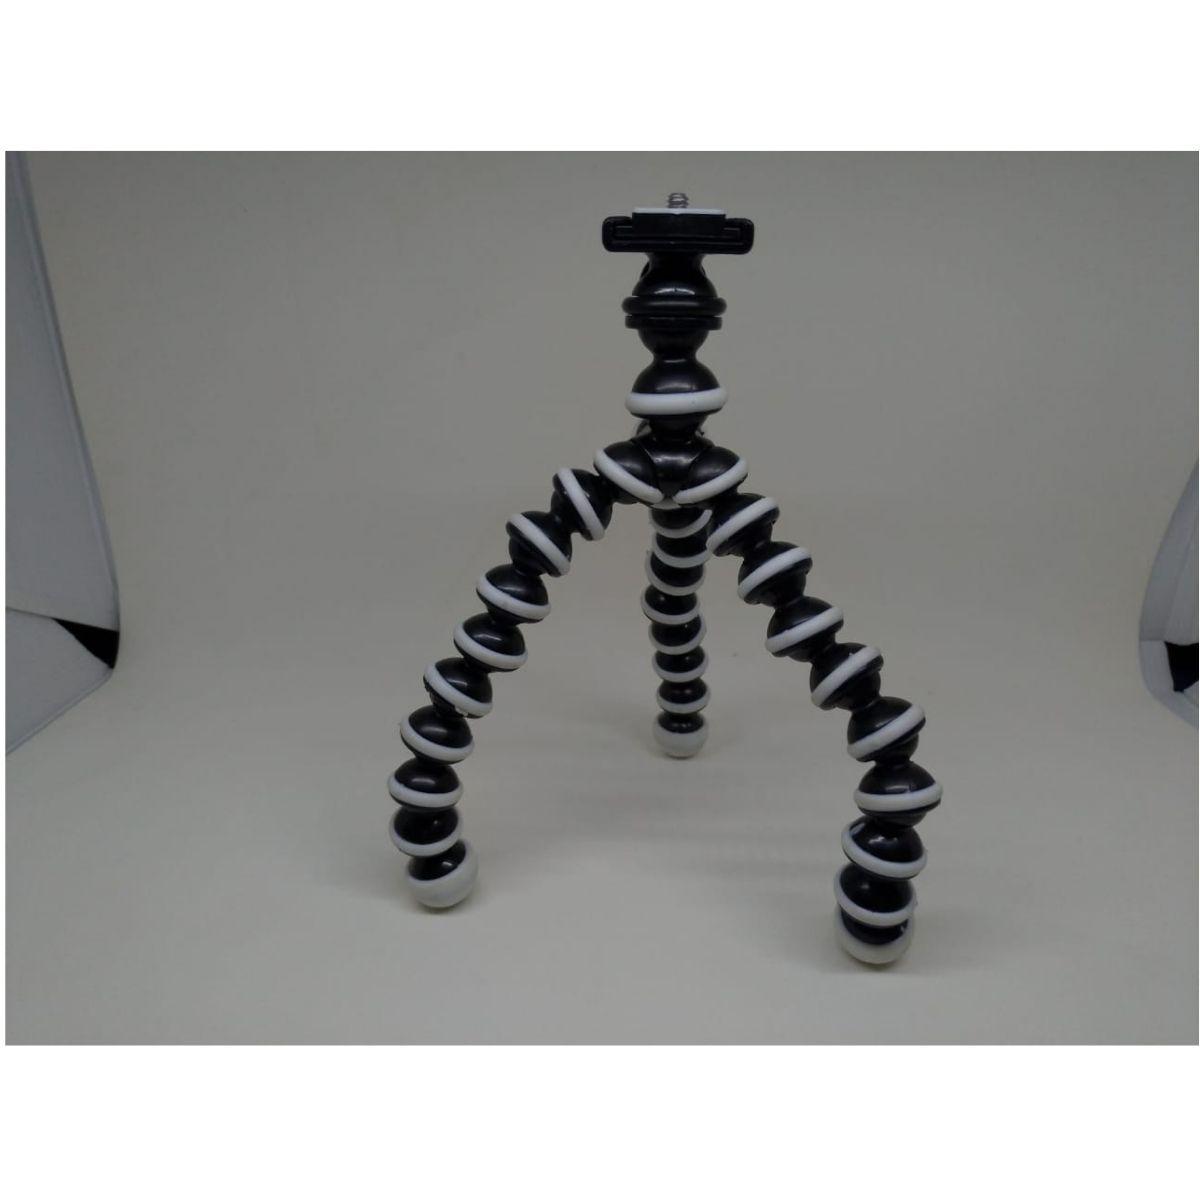 Kit Mini Estúdio Fotográfico 35 cm Instafold + Tripé Gorila Para Câmera - Instafold + SM816